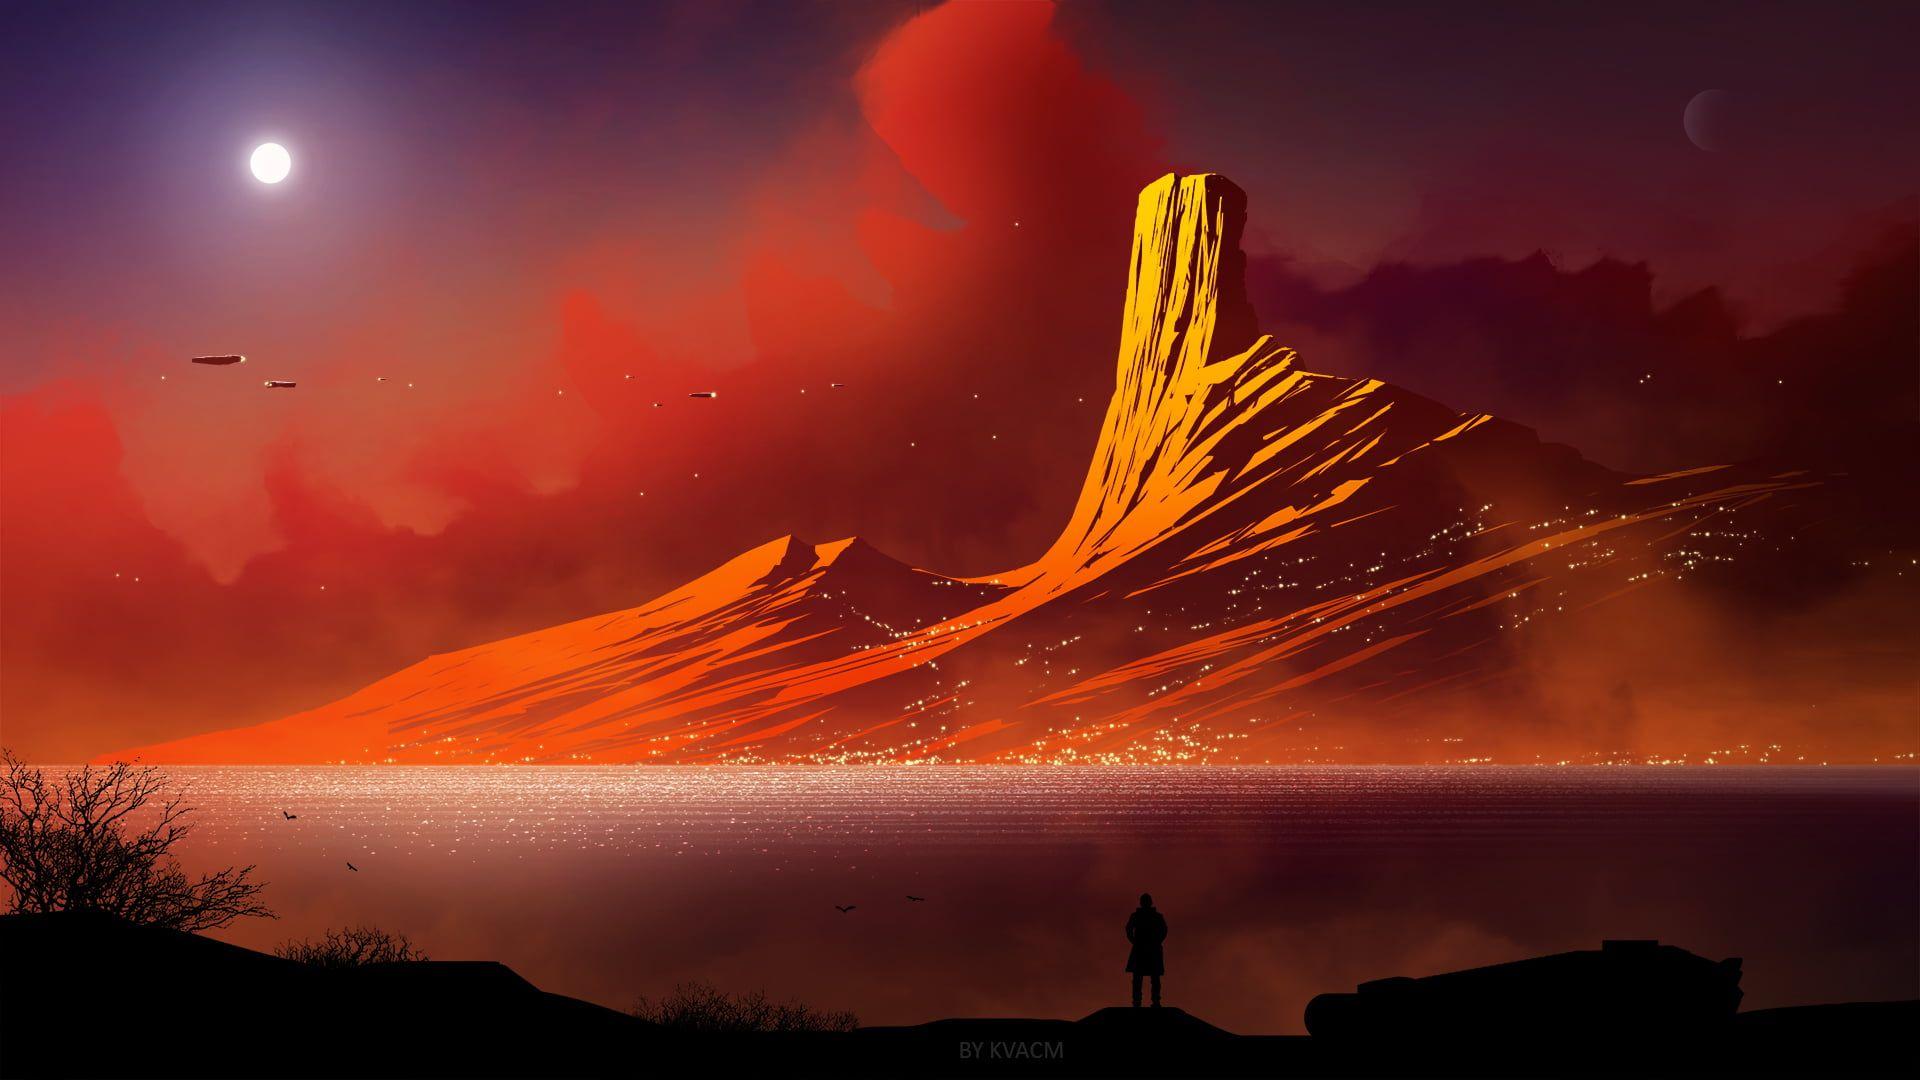 mountain illustration digital art #mountains #landscape science fiction fan  art #artwork #Kvacm fantasy ar… | Mountain illustration, Background images, Hd  wallpaper